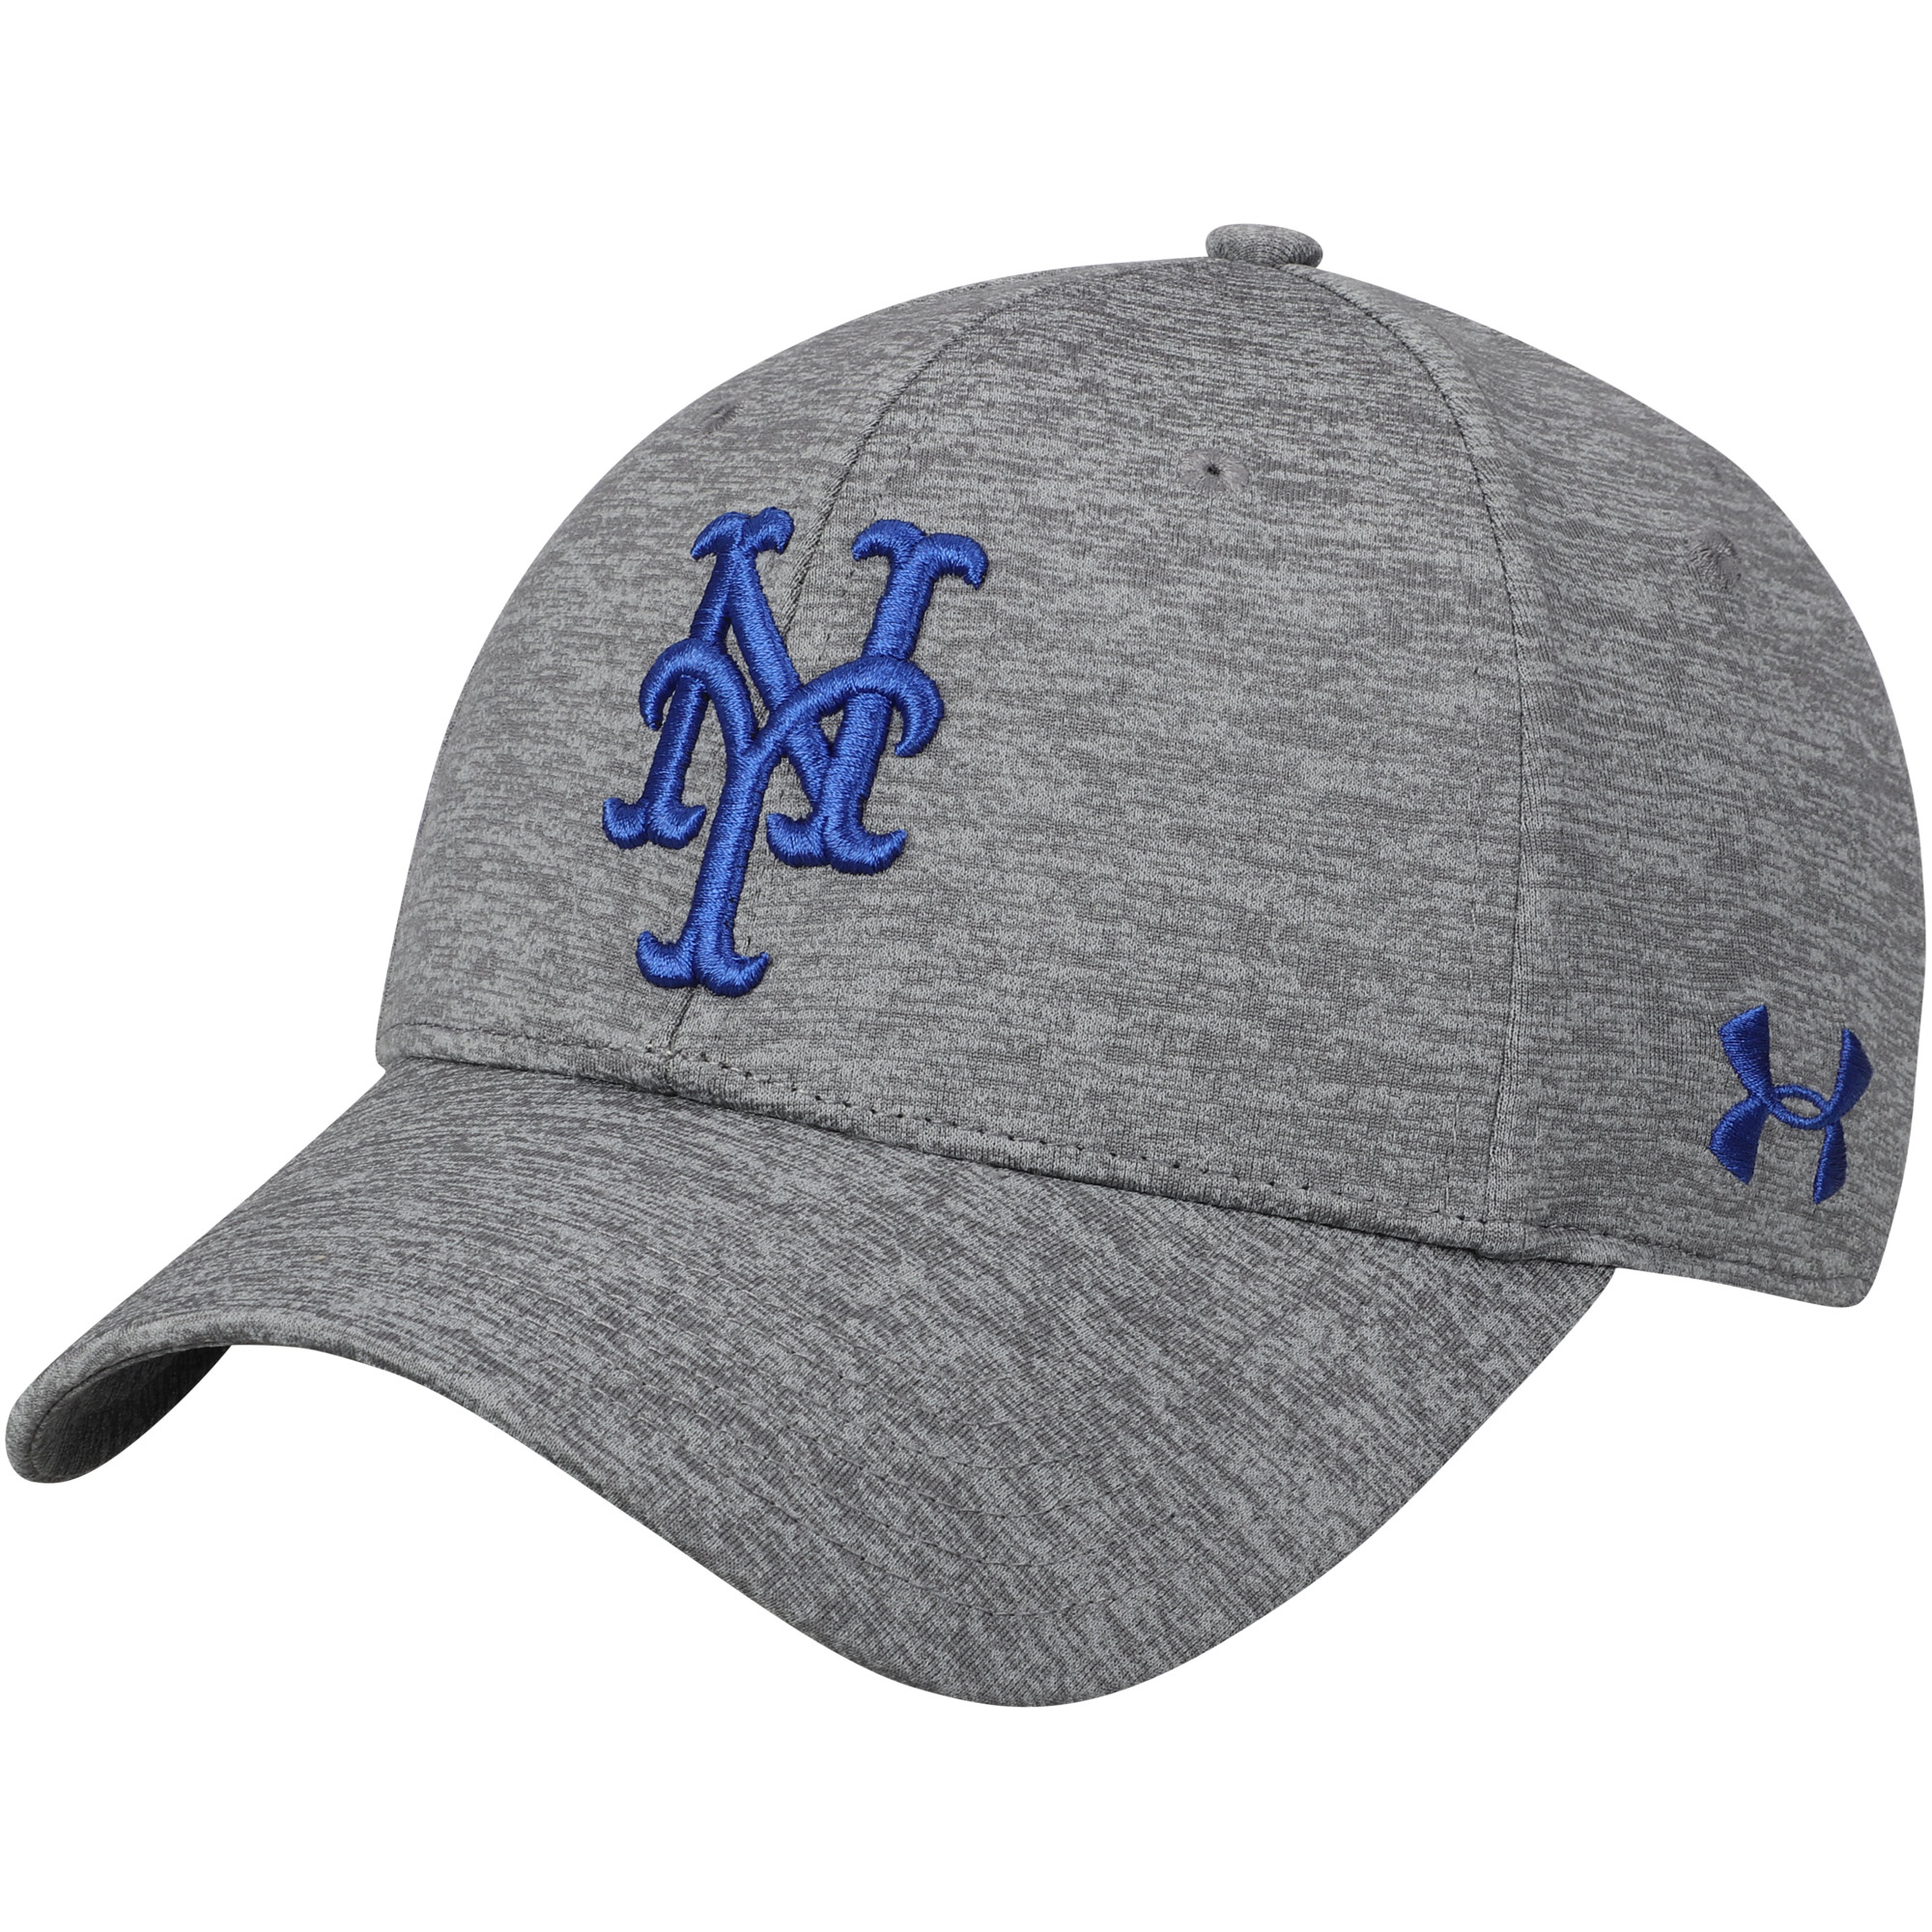 New York Mets Under Armour Twist Closer Performance Snapback Adjustable Hat - Heathered Gray - OSFA